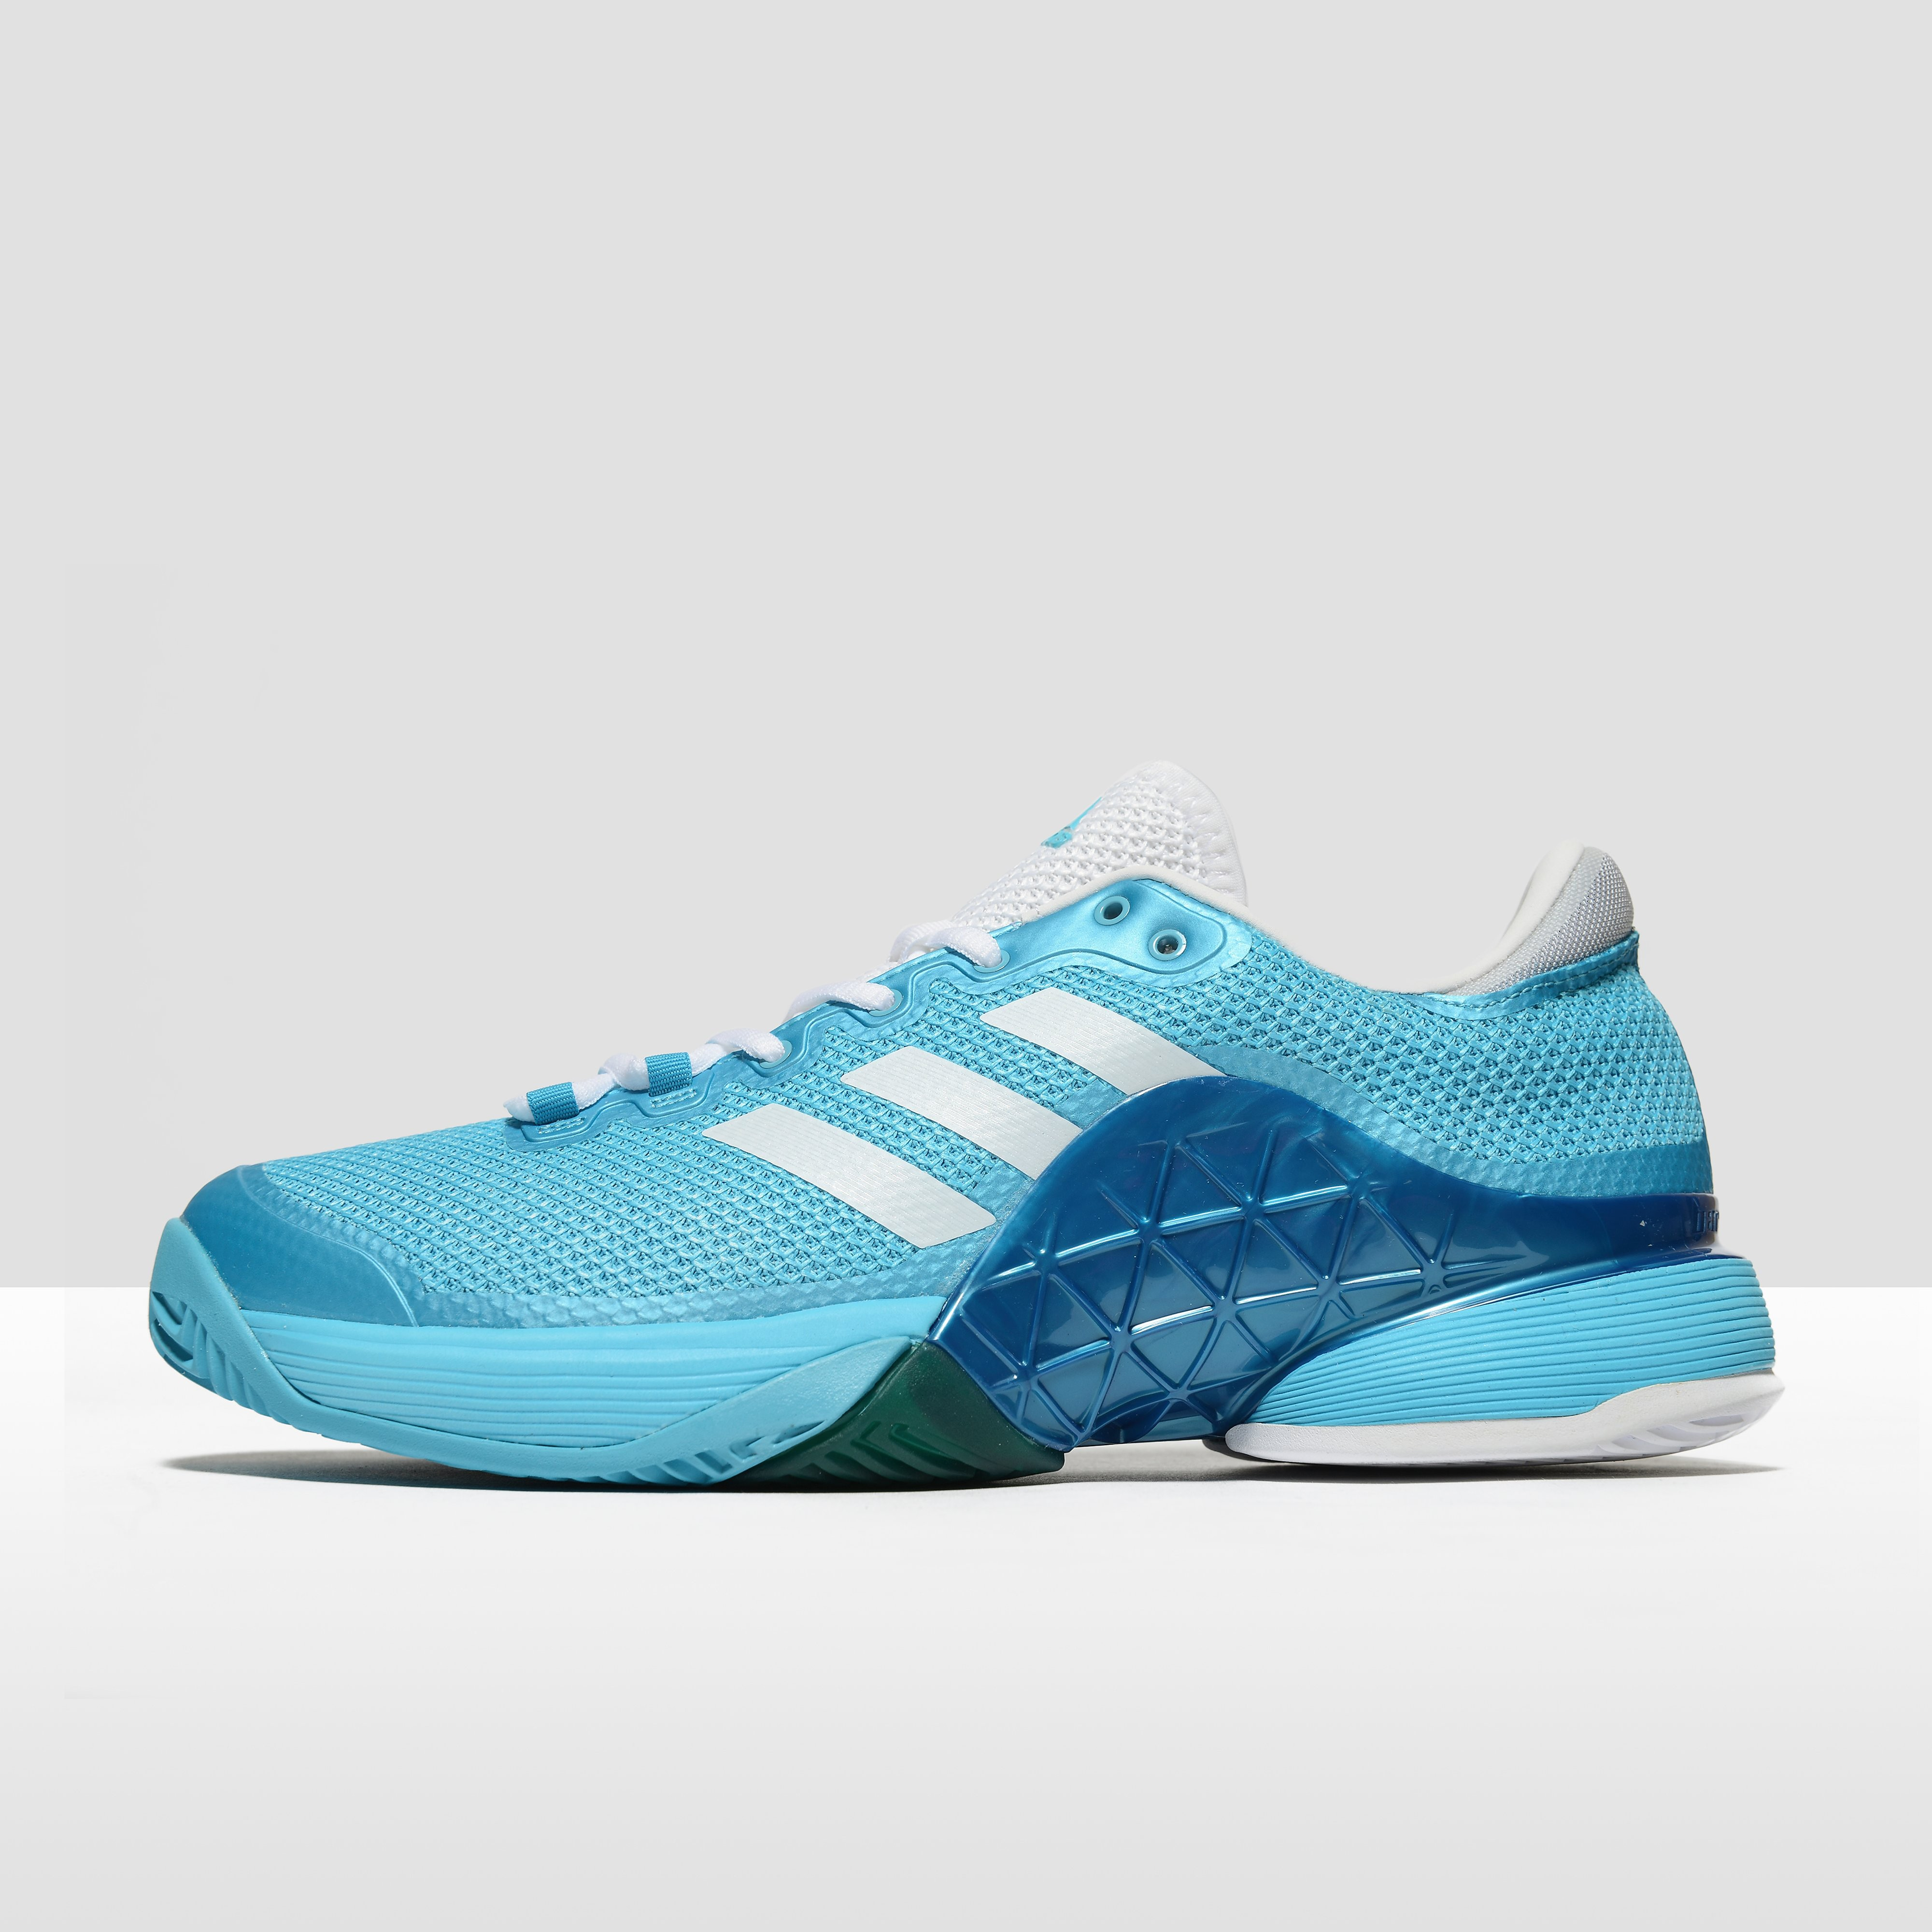 adidas Barricade 2017 Men's Tennis Shoes